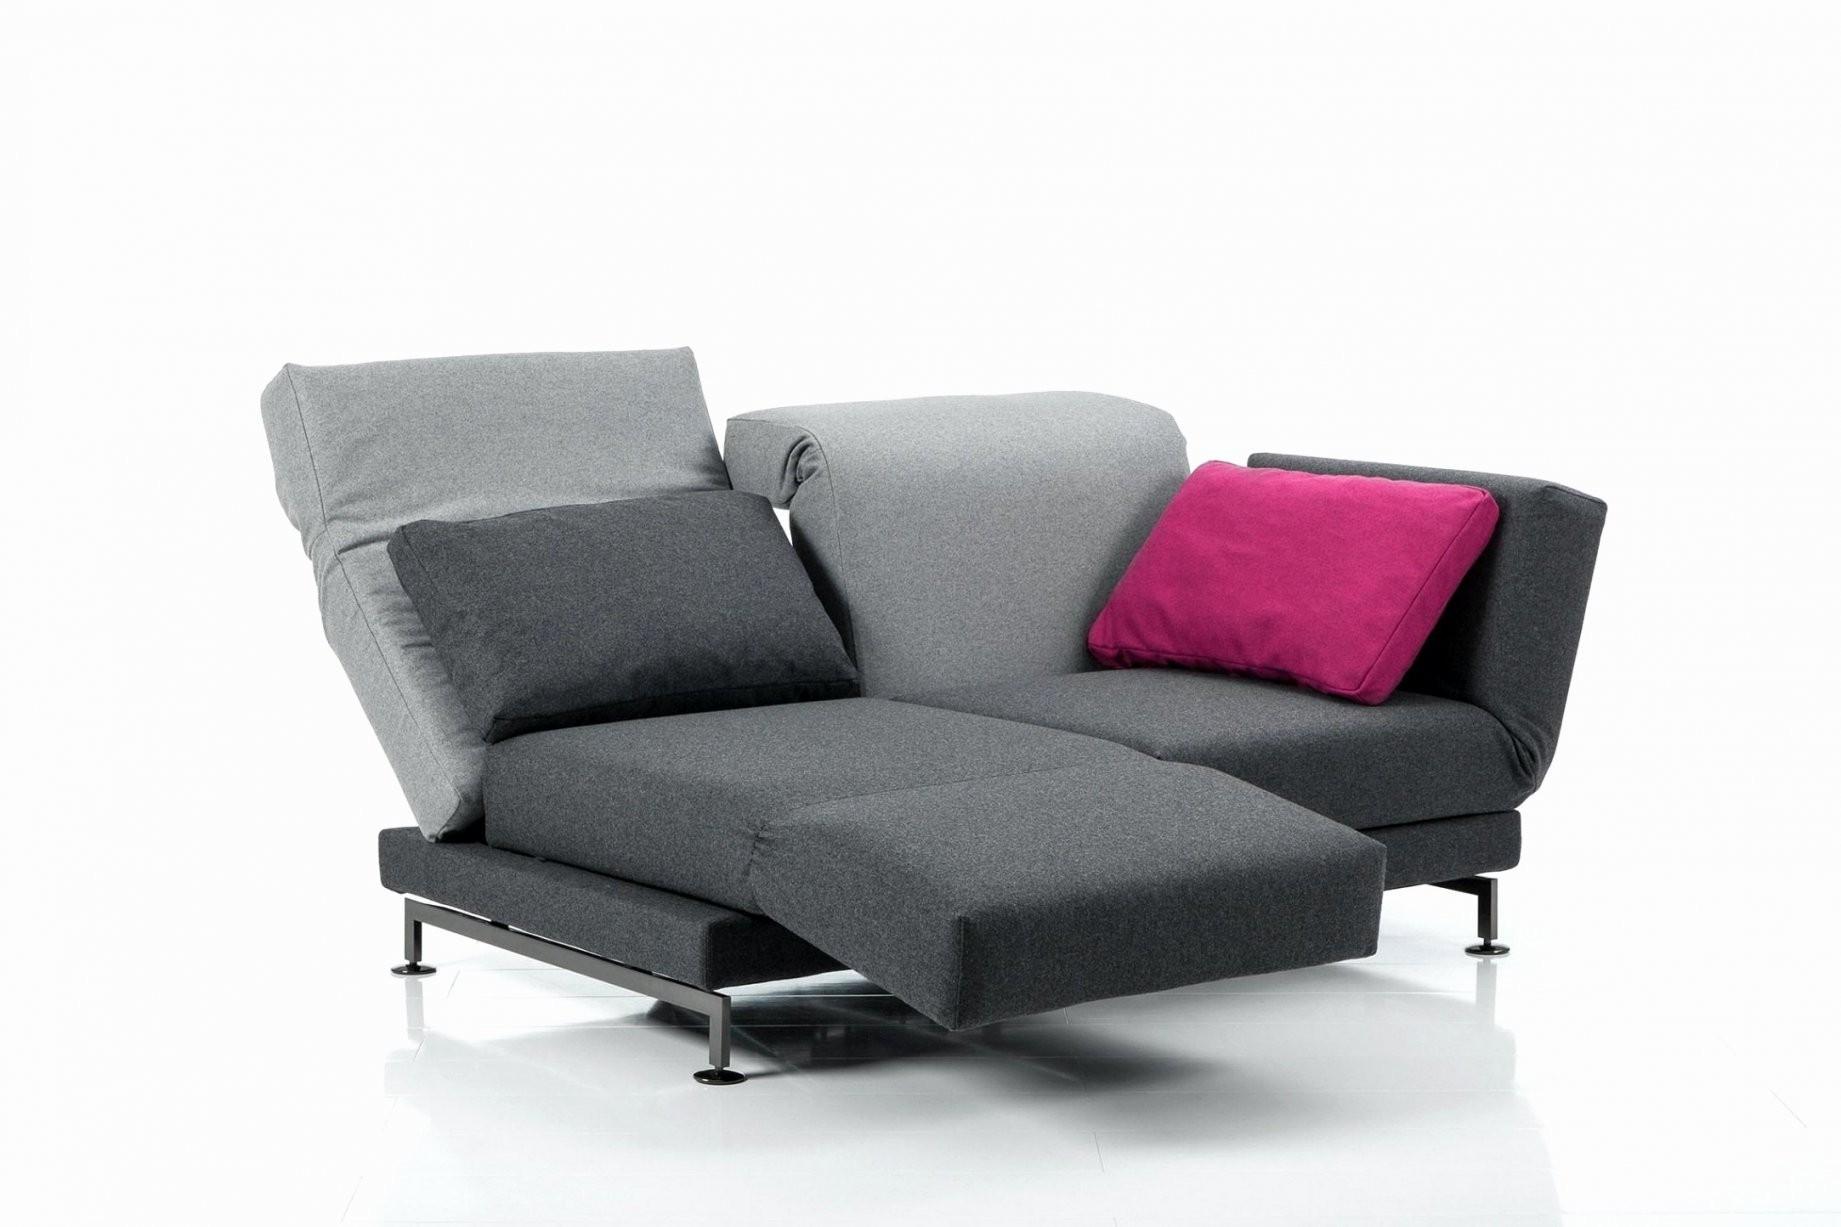 2 Sitzer Schlafsofa Neu 2 Sitzer Sofa Mit Recamiere Elegant Sofa von 2 Sitzer Sofa Mit Recamiere Photo